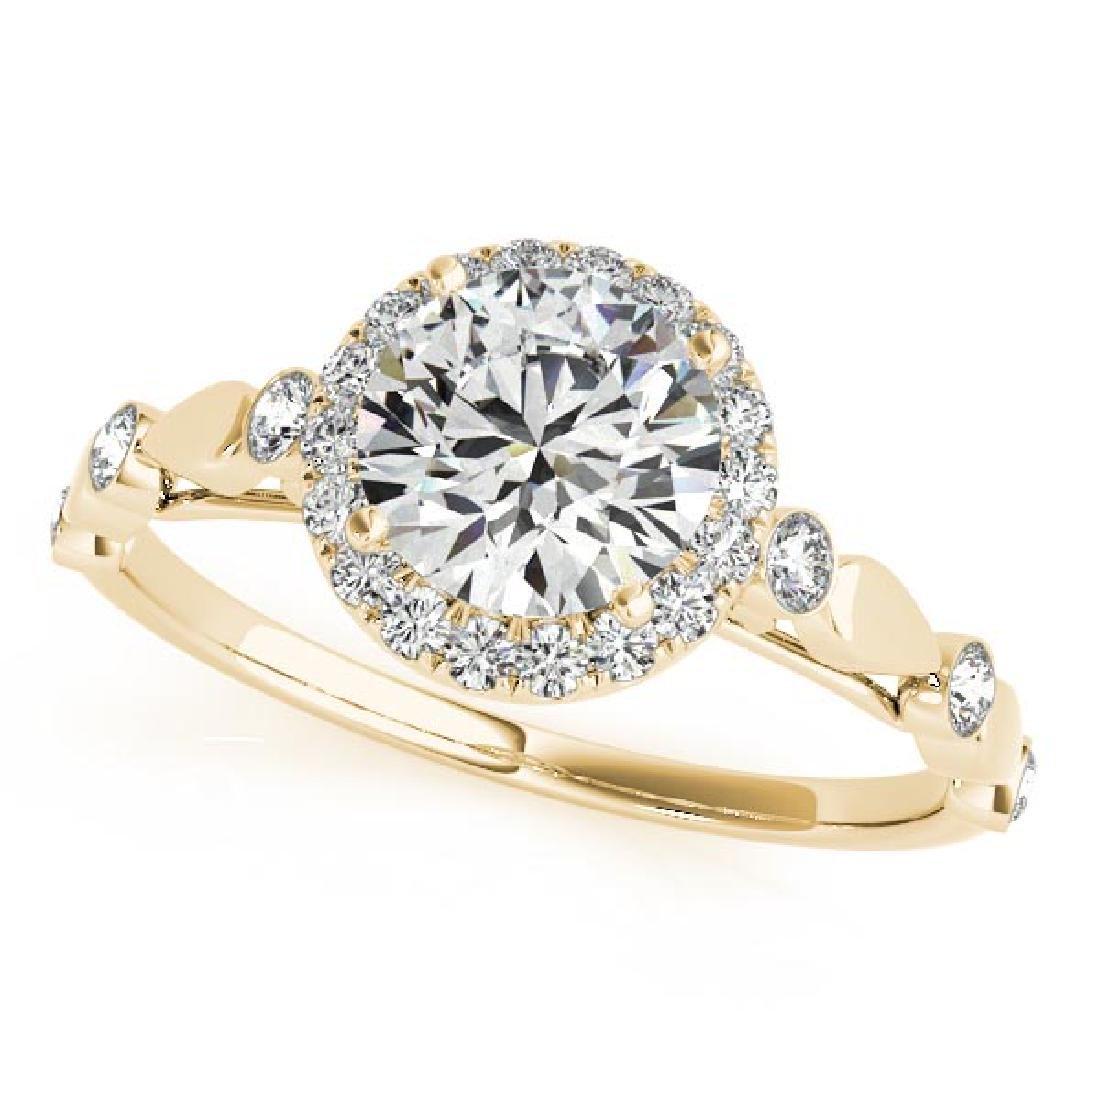 CERTIFIED 18K YELLOW GOLD 1.56 CT G-H/VS-SI1 DIAMOND HA